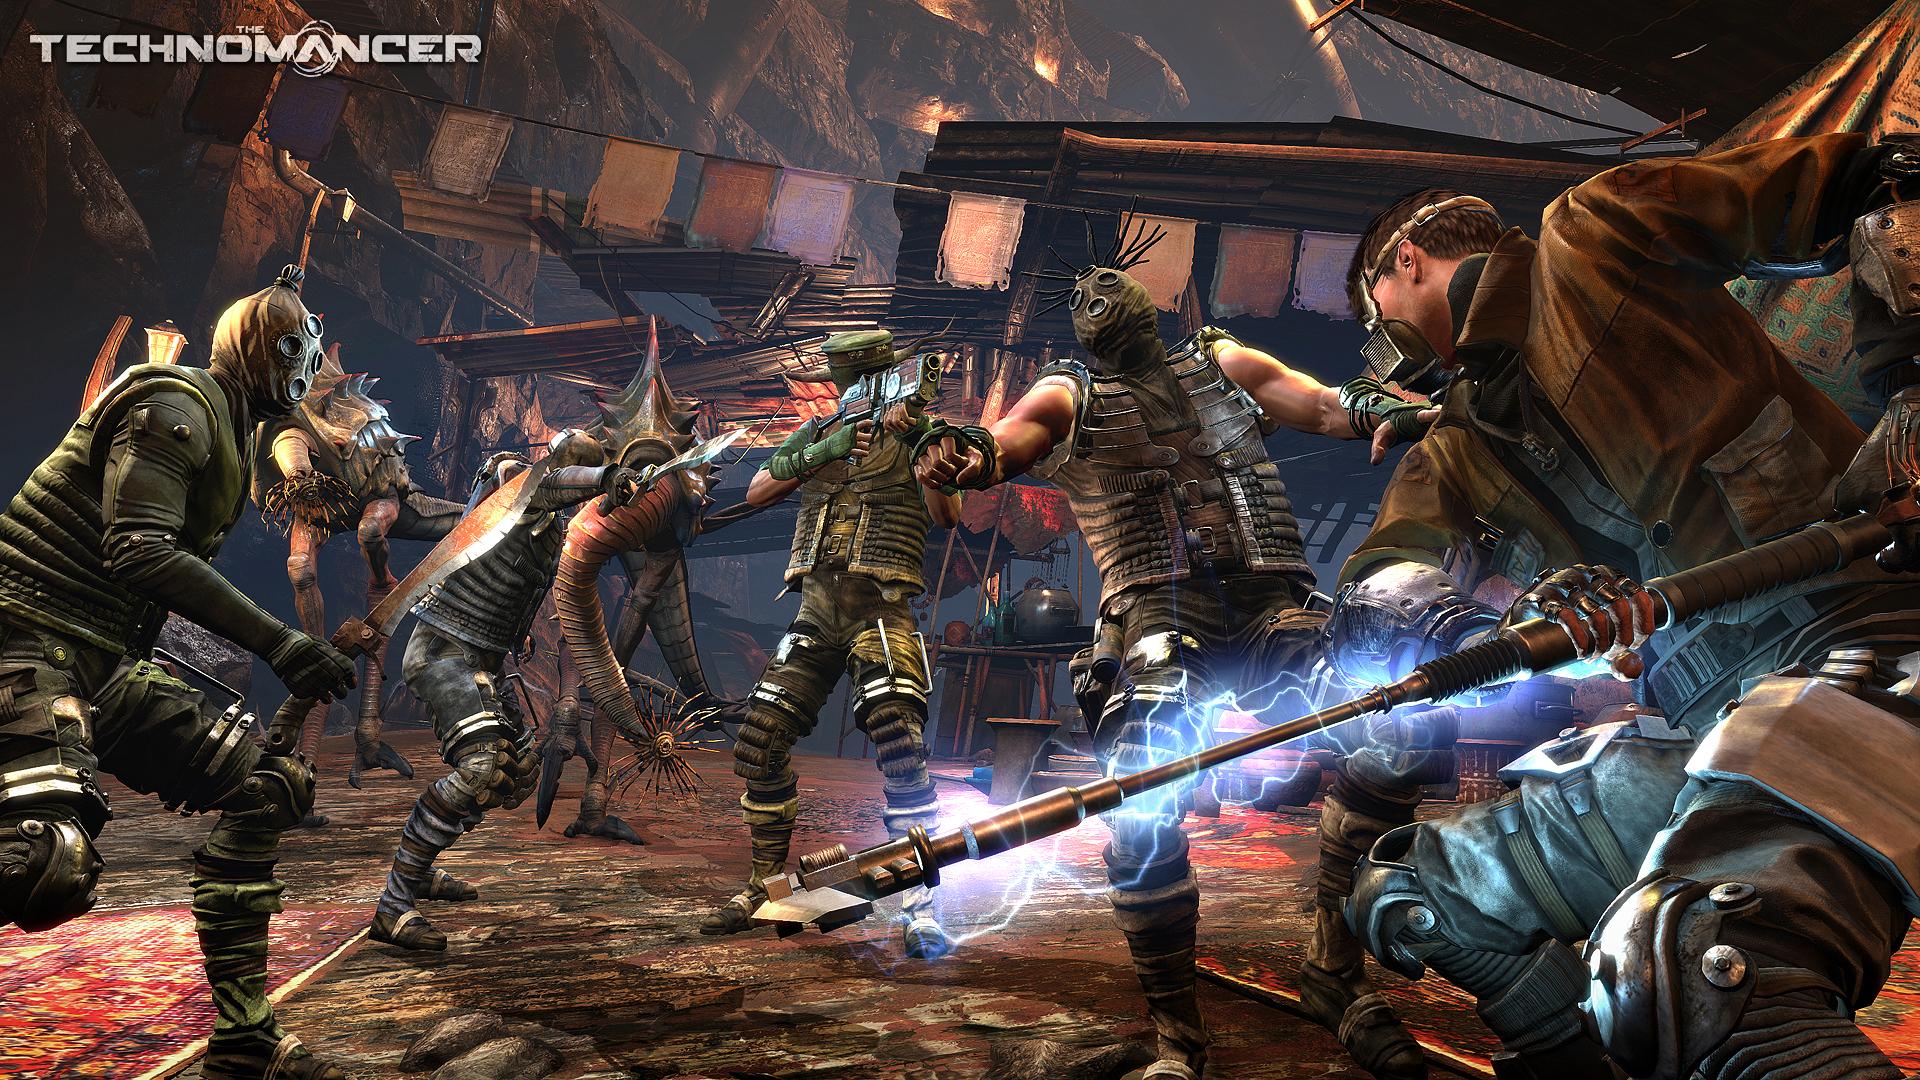 New Technomancer Gameplay Trailer Revealed